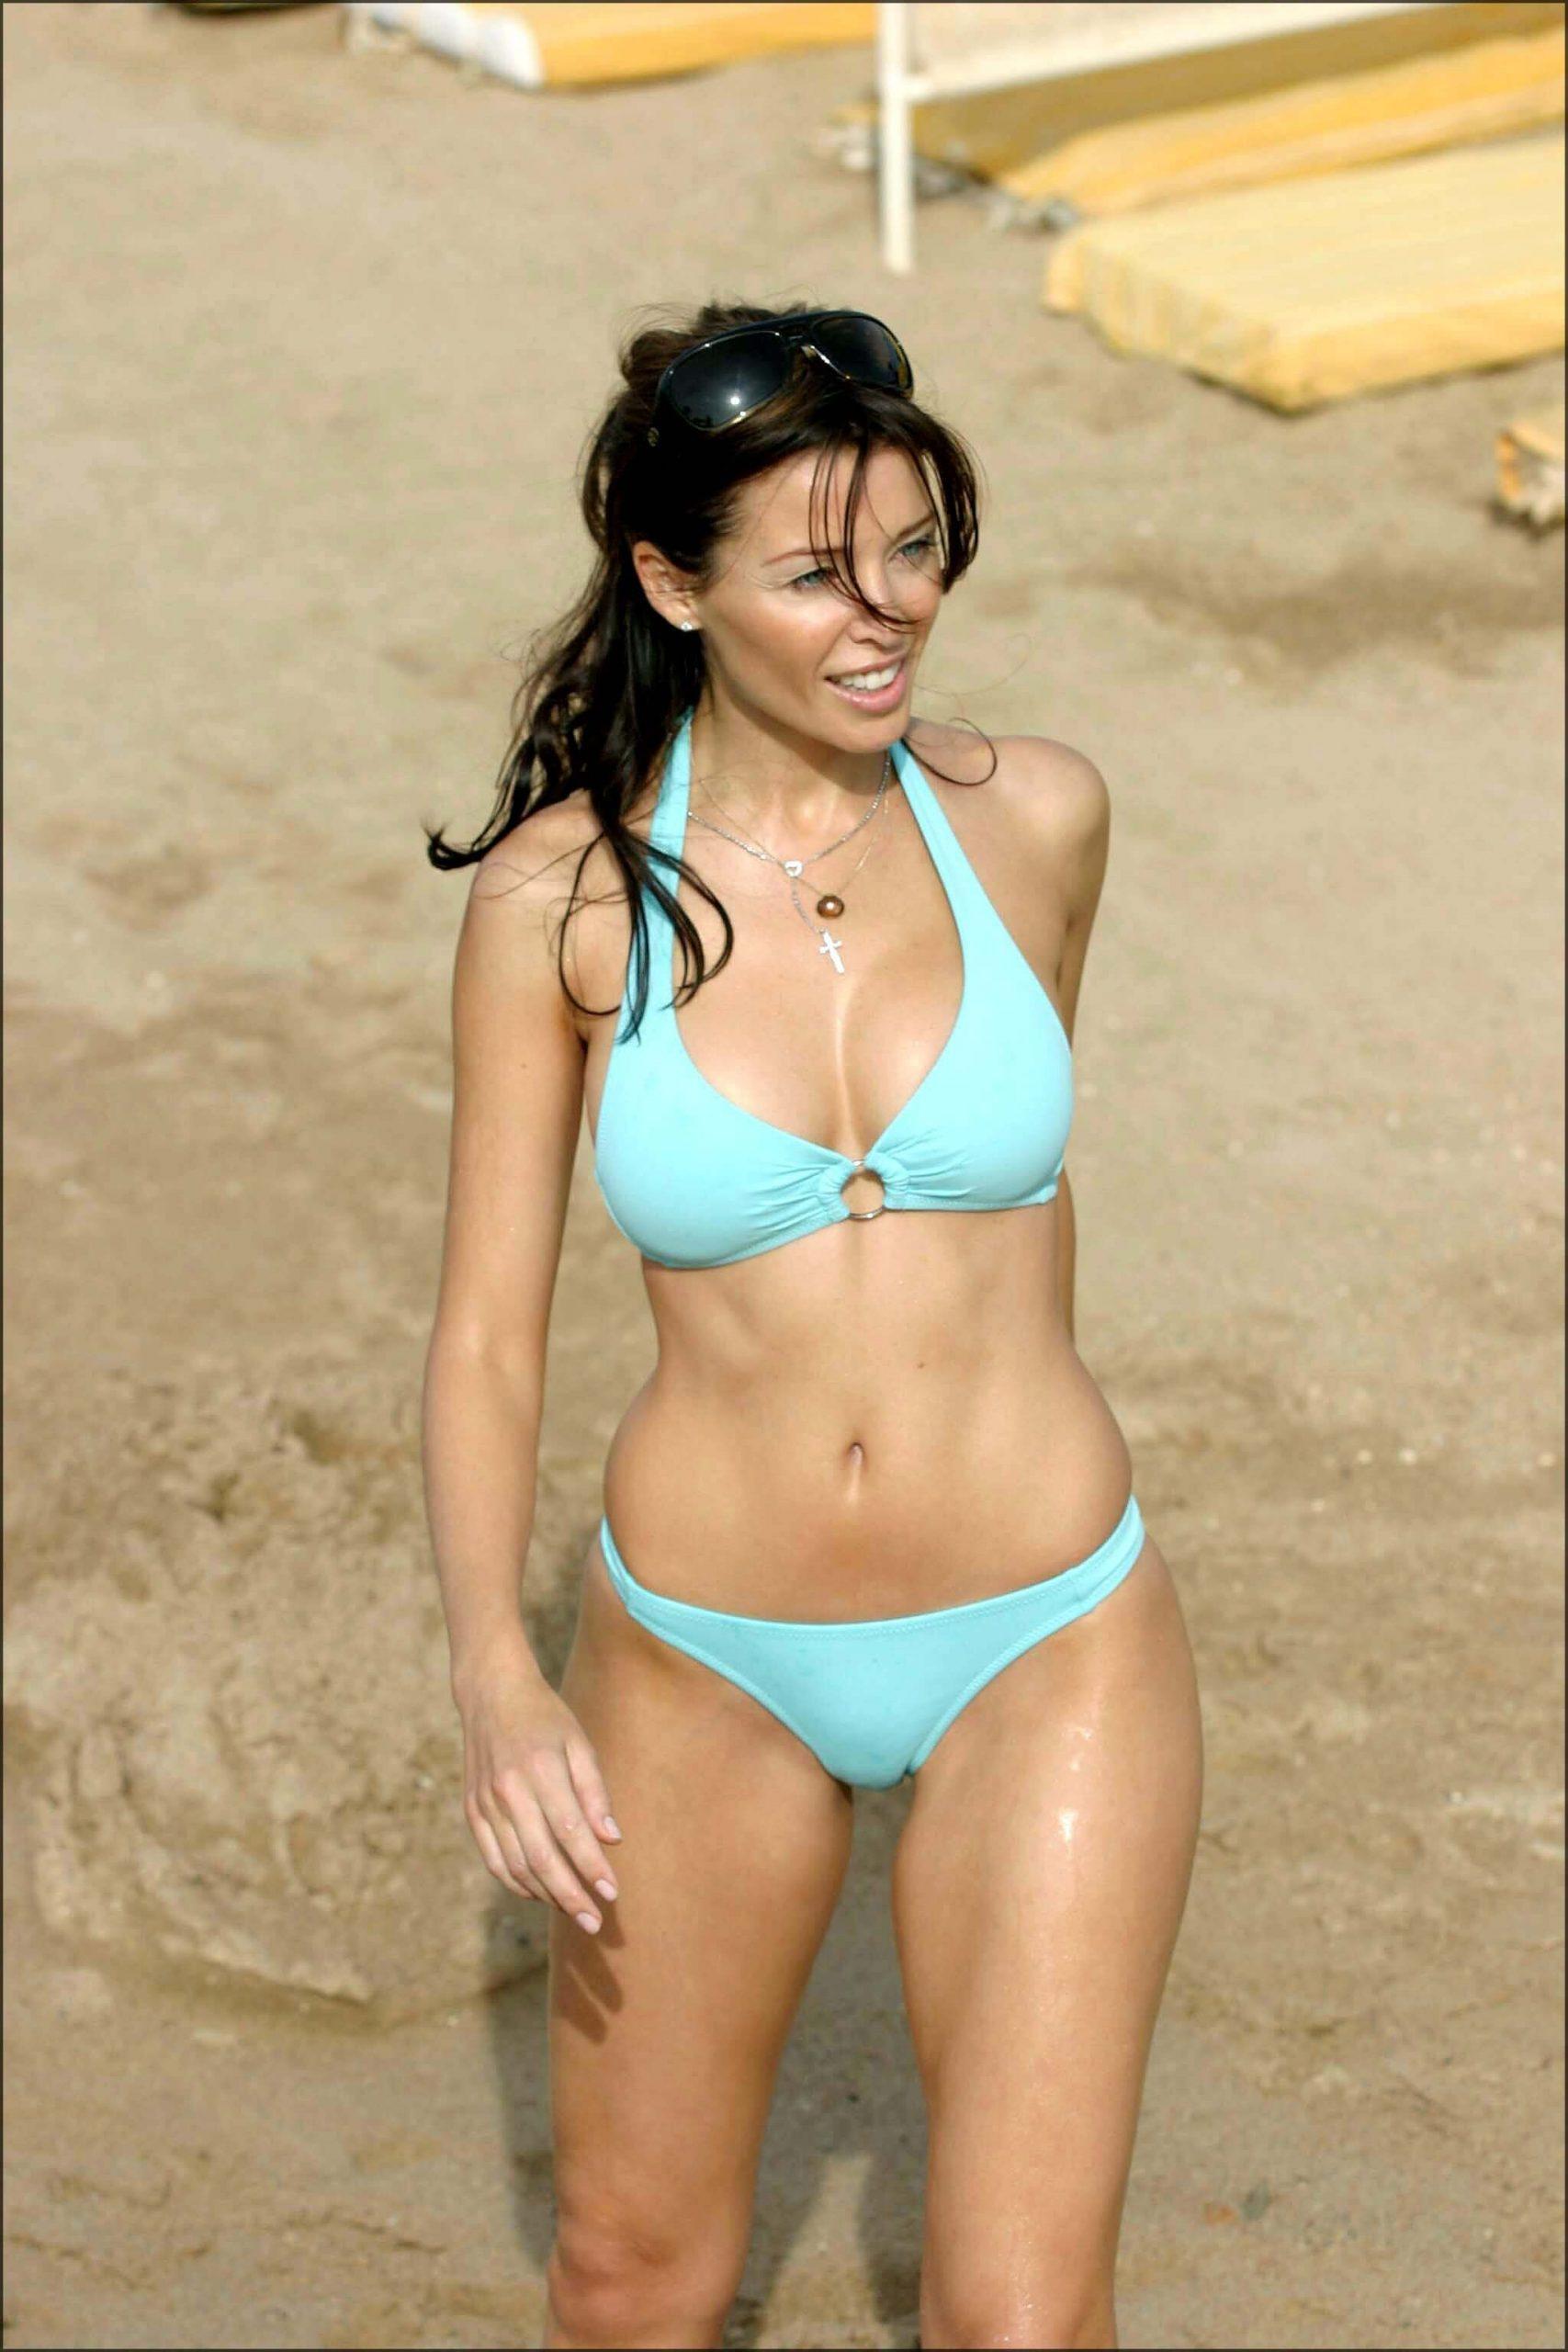 Dannii Minogue bikini pics